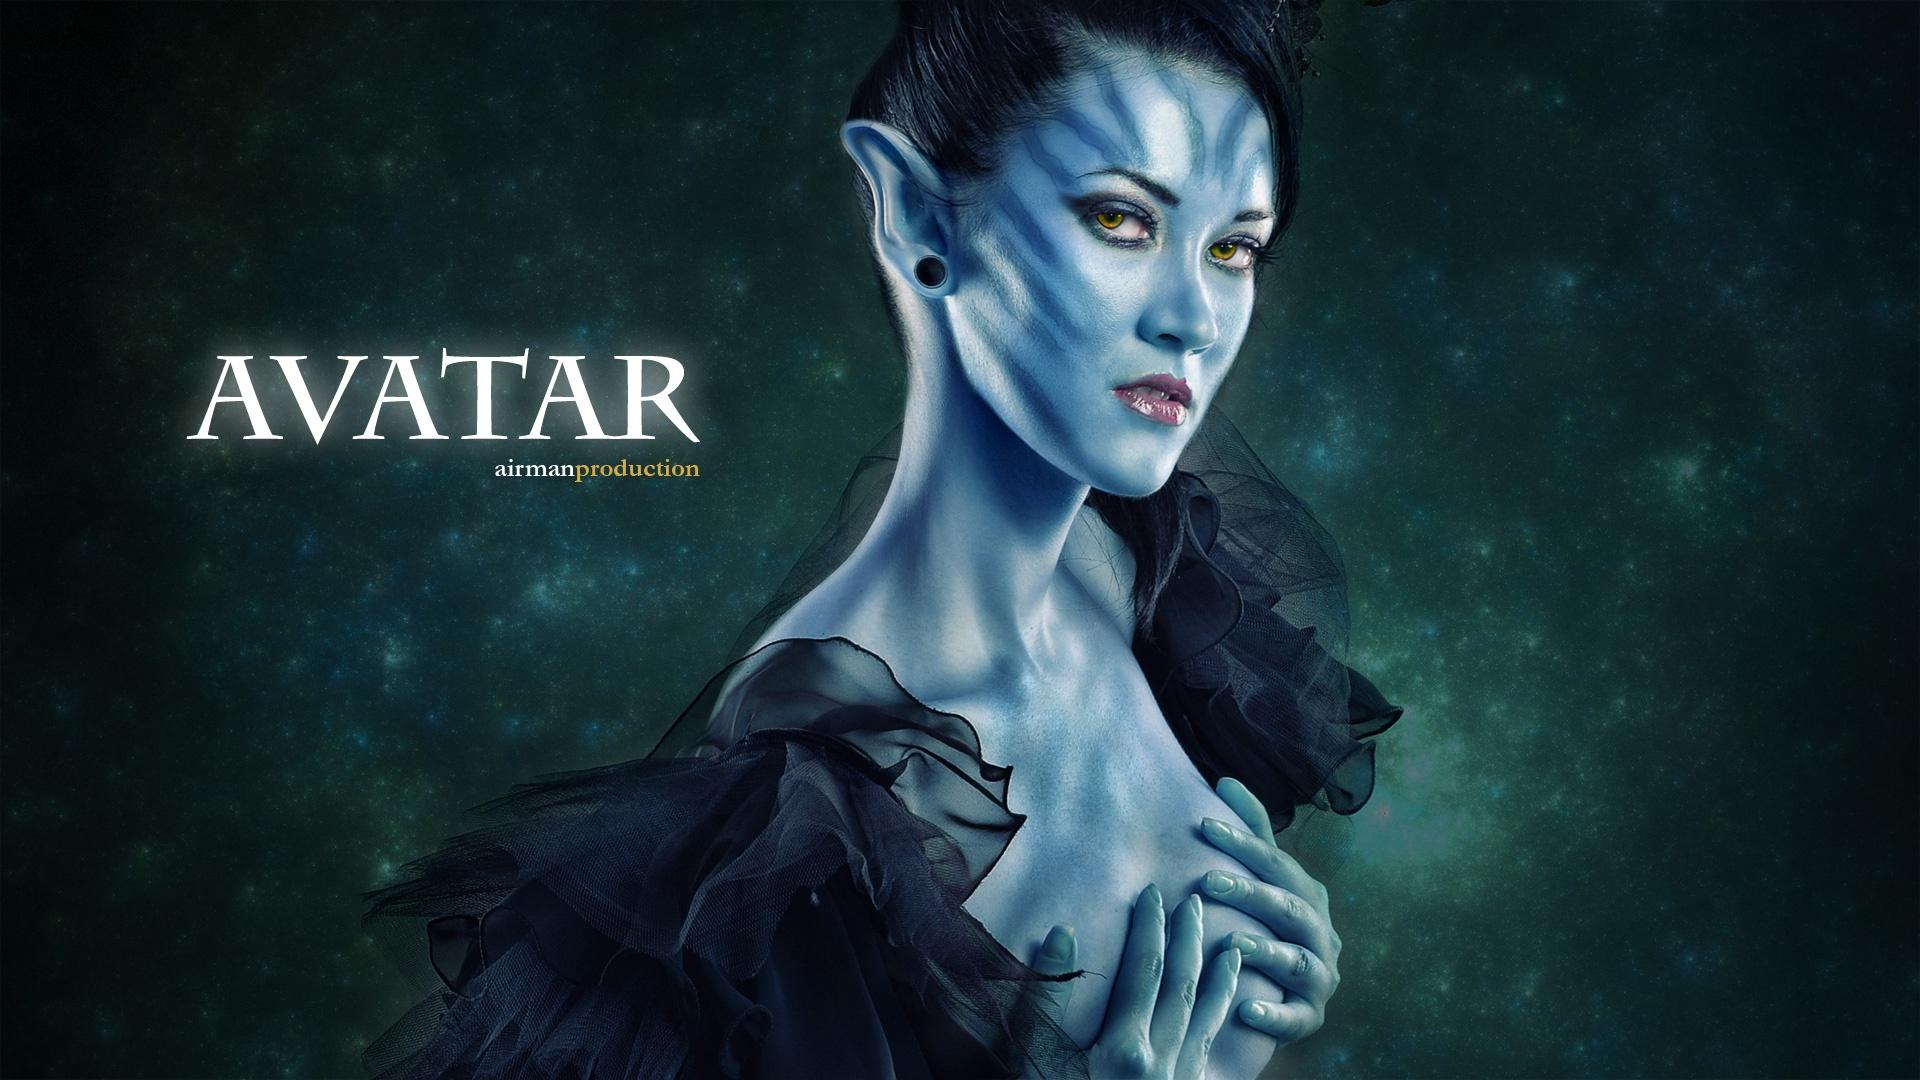 Avatar Navi Gay Porn avatar navi sex porn videos - sex porn images